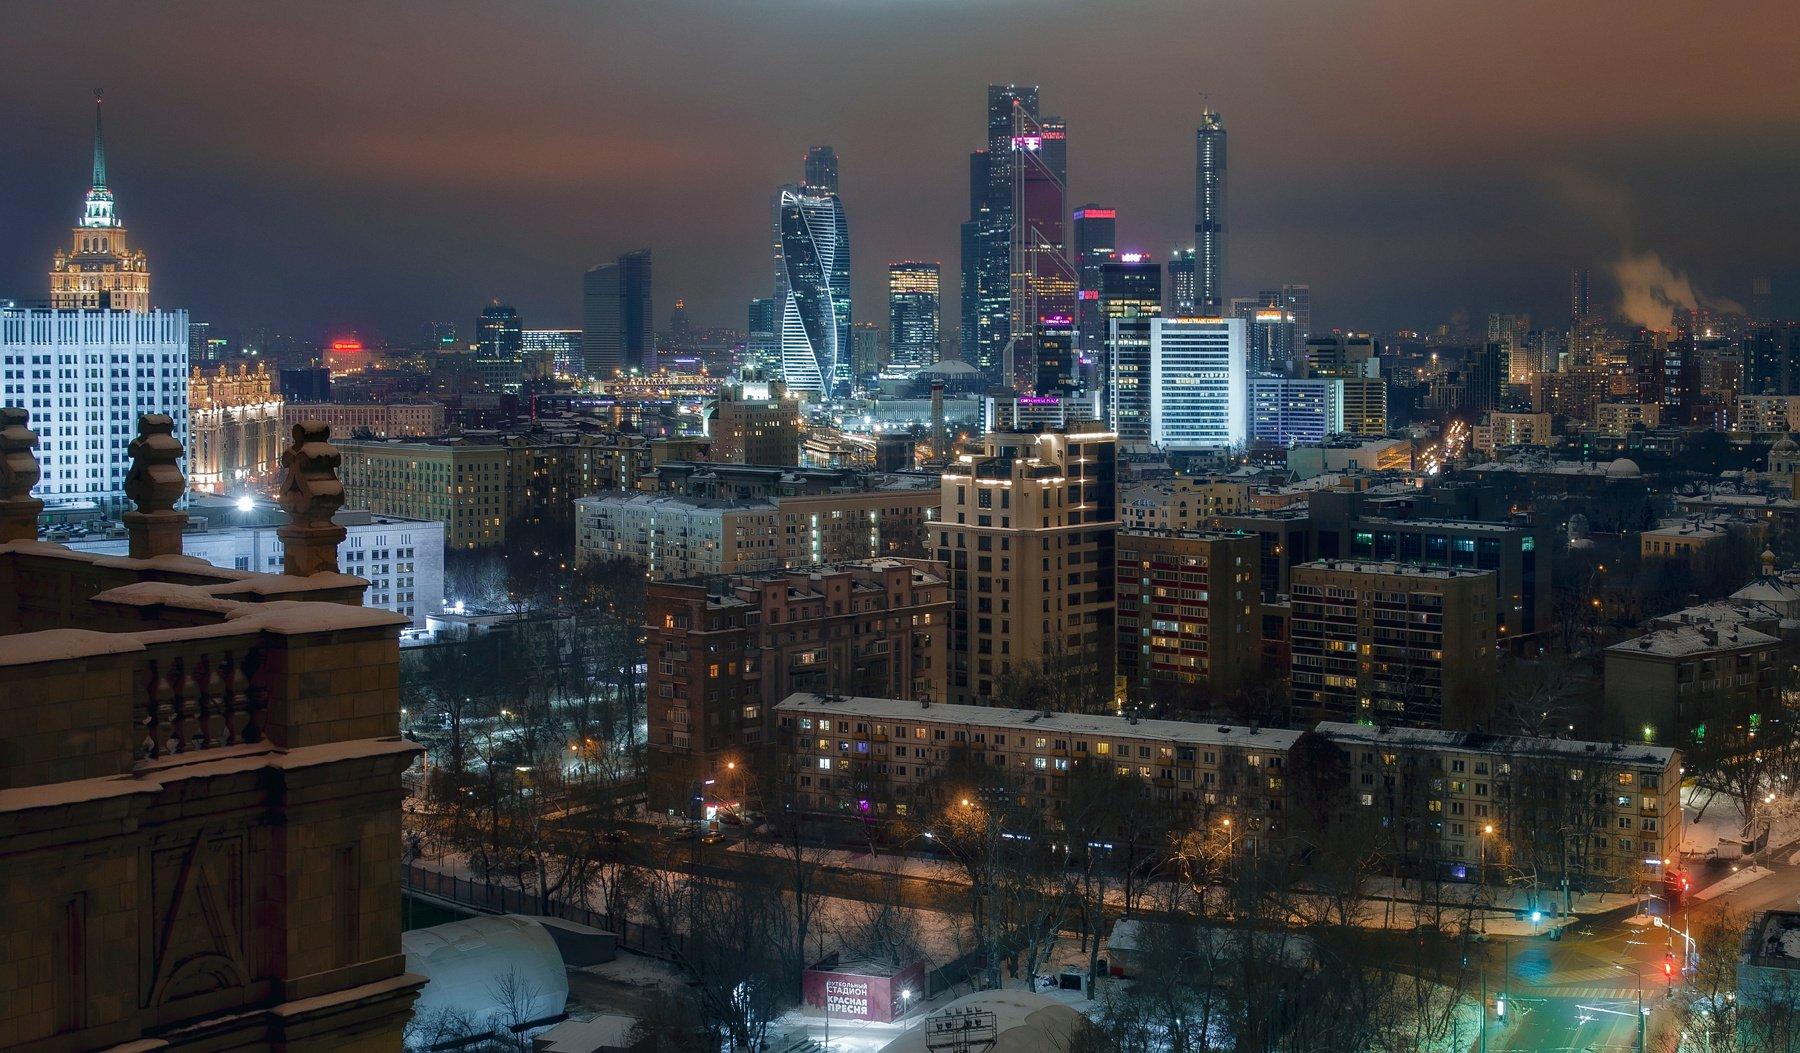 москва, город, архитектура, ночь, Алексей Ермаков